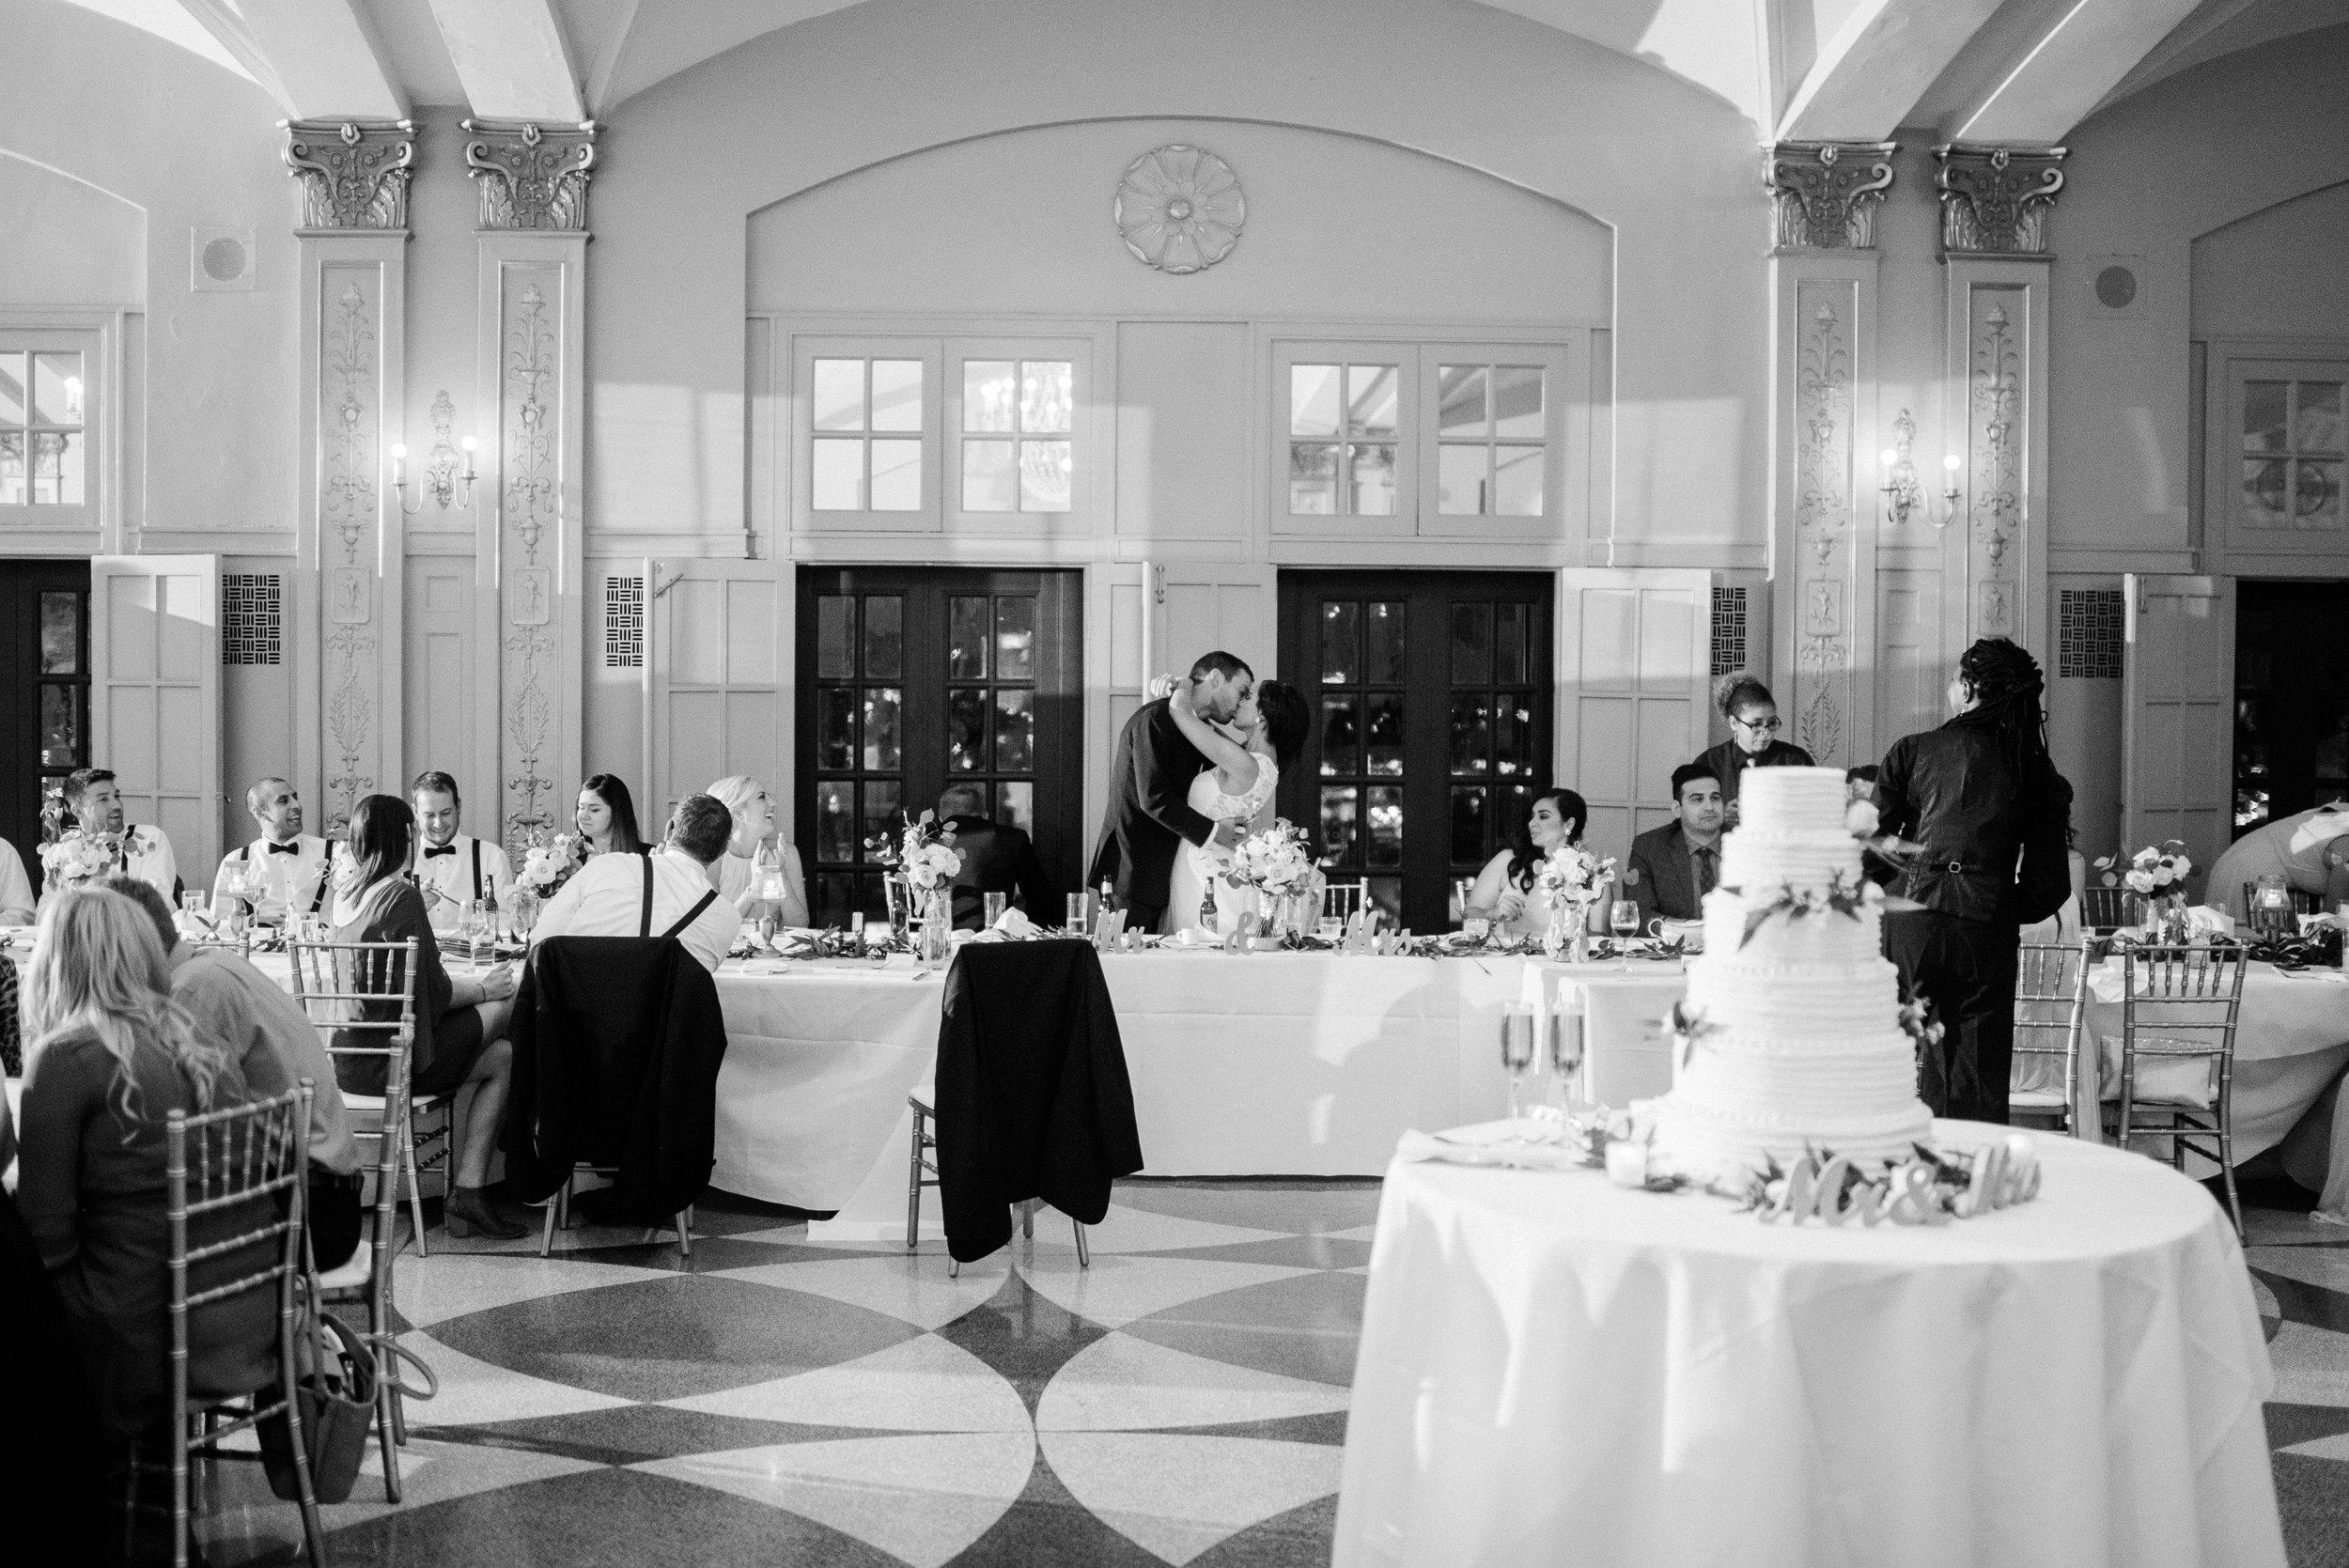 Redemptorist Church, President Hotel Wedding Ceremony and Reception